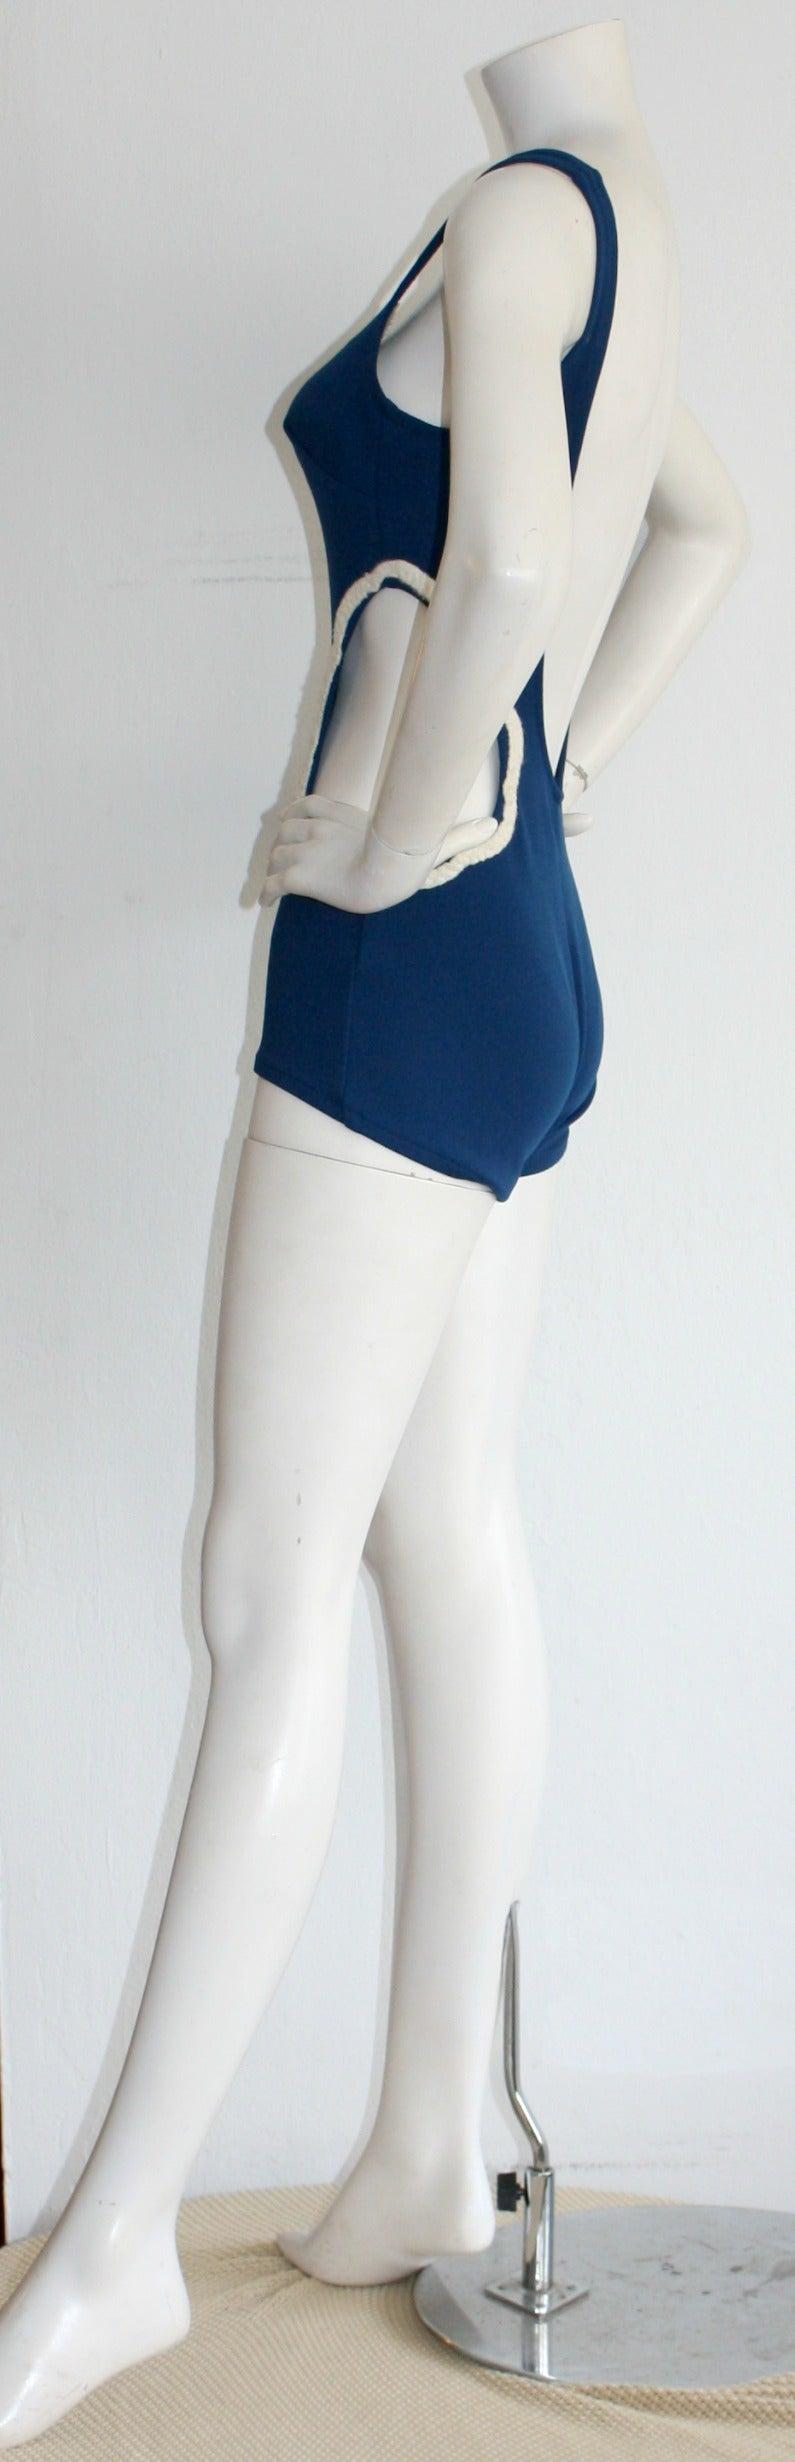 Women's 1960s Vintage Oleg Cassini ' Peter Pan ' Space Age Cut-Out Swimsuit For Sale